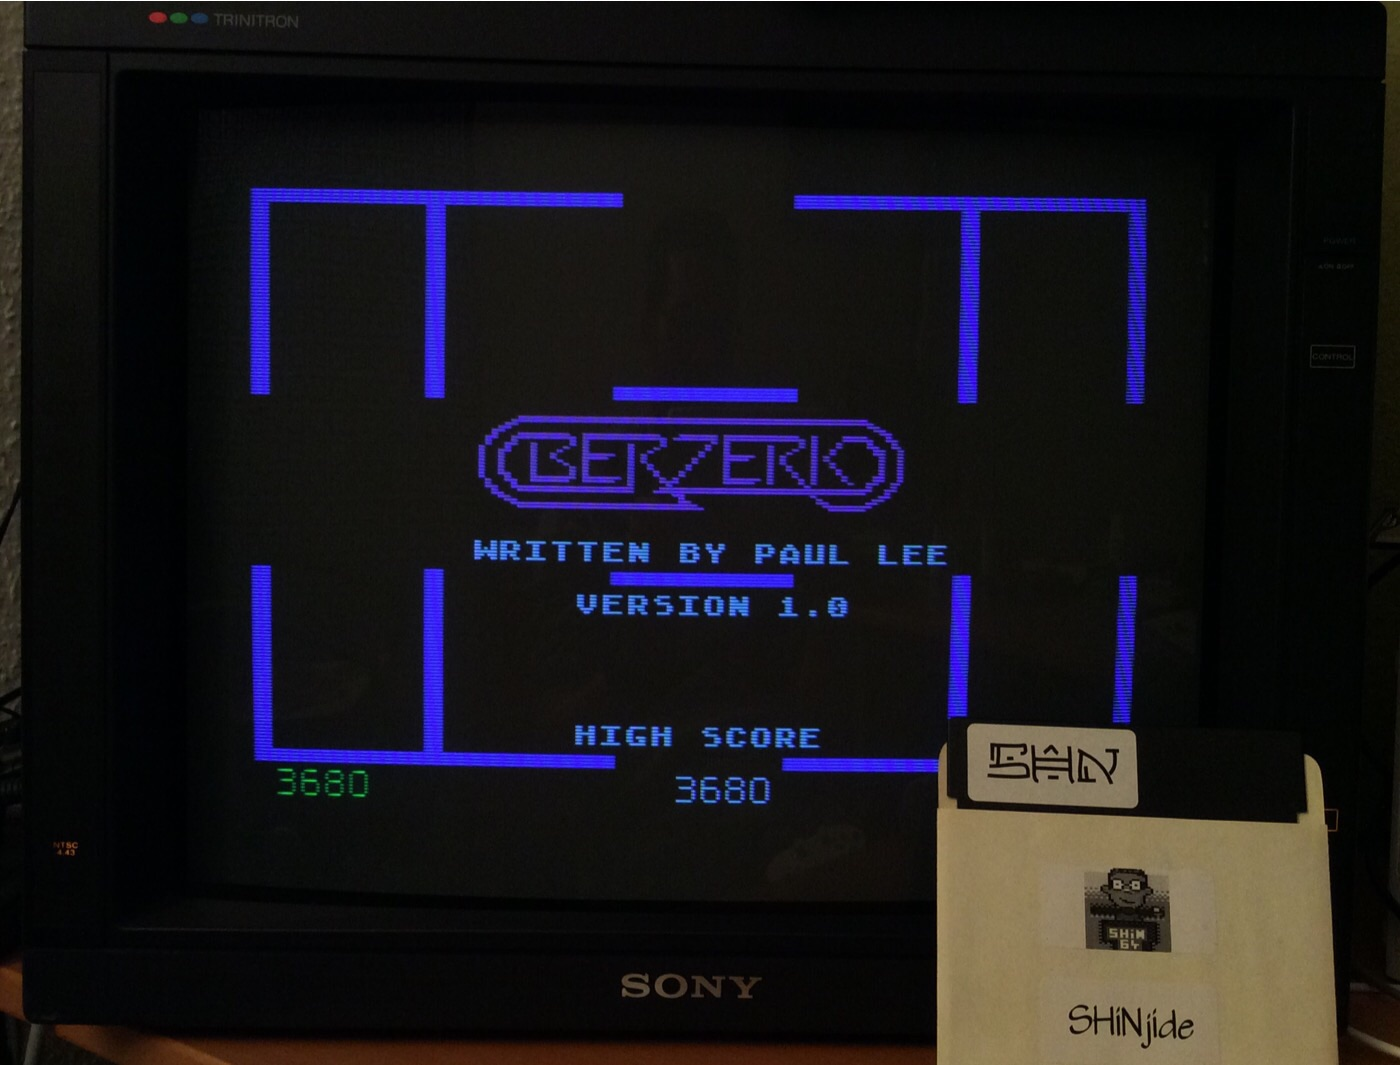 SHiNjide: Berzerk (Sega Genesis / MegaDrive Emulated) 3,680 points on 2014-12-20 10:23:13